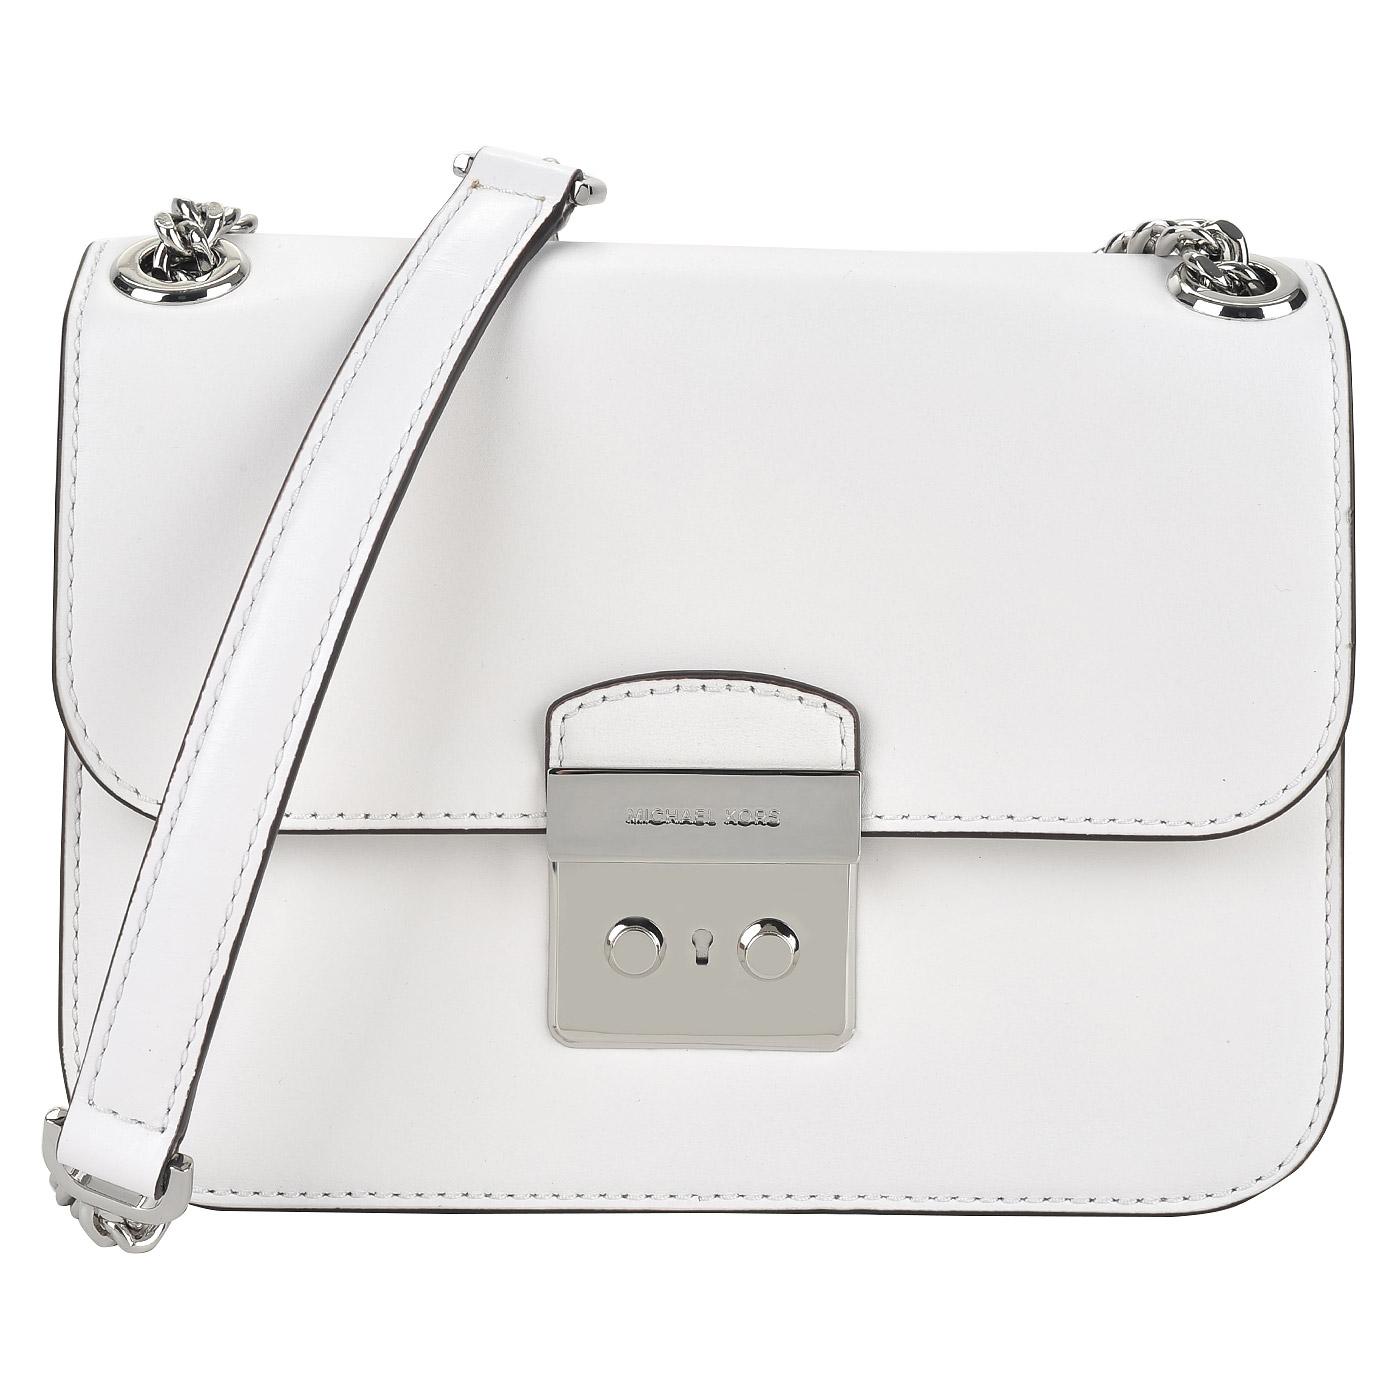 3120725e1db5 ... Женская кожаная сумочка на цепочке через плечо Michael Kors Sloan Editor  ...